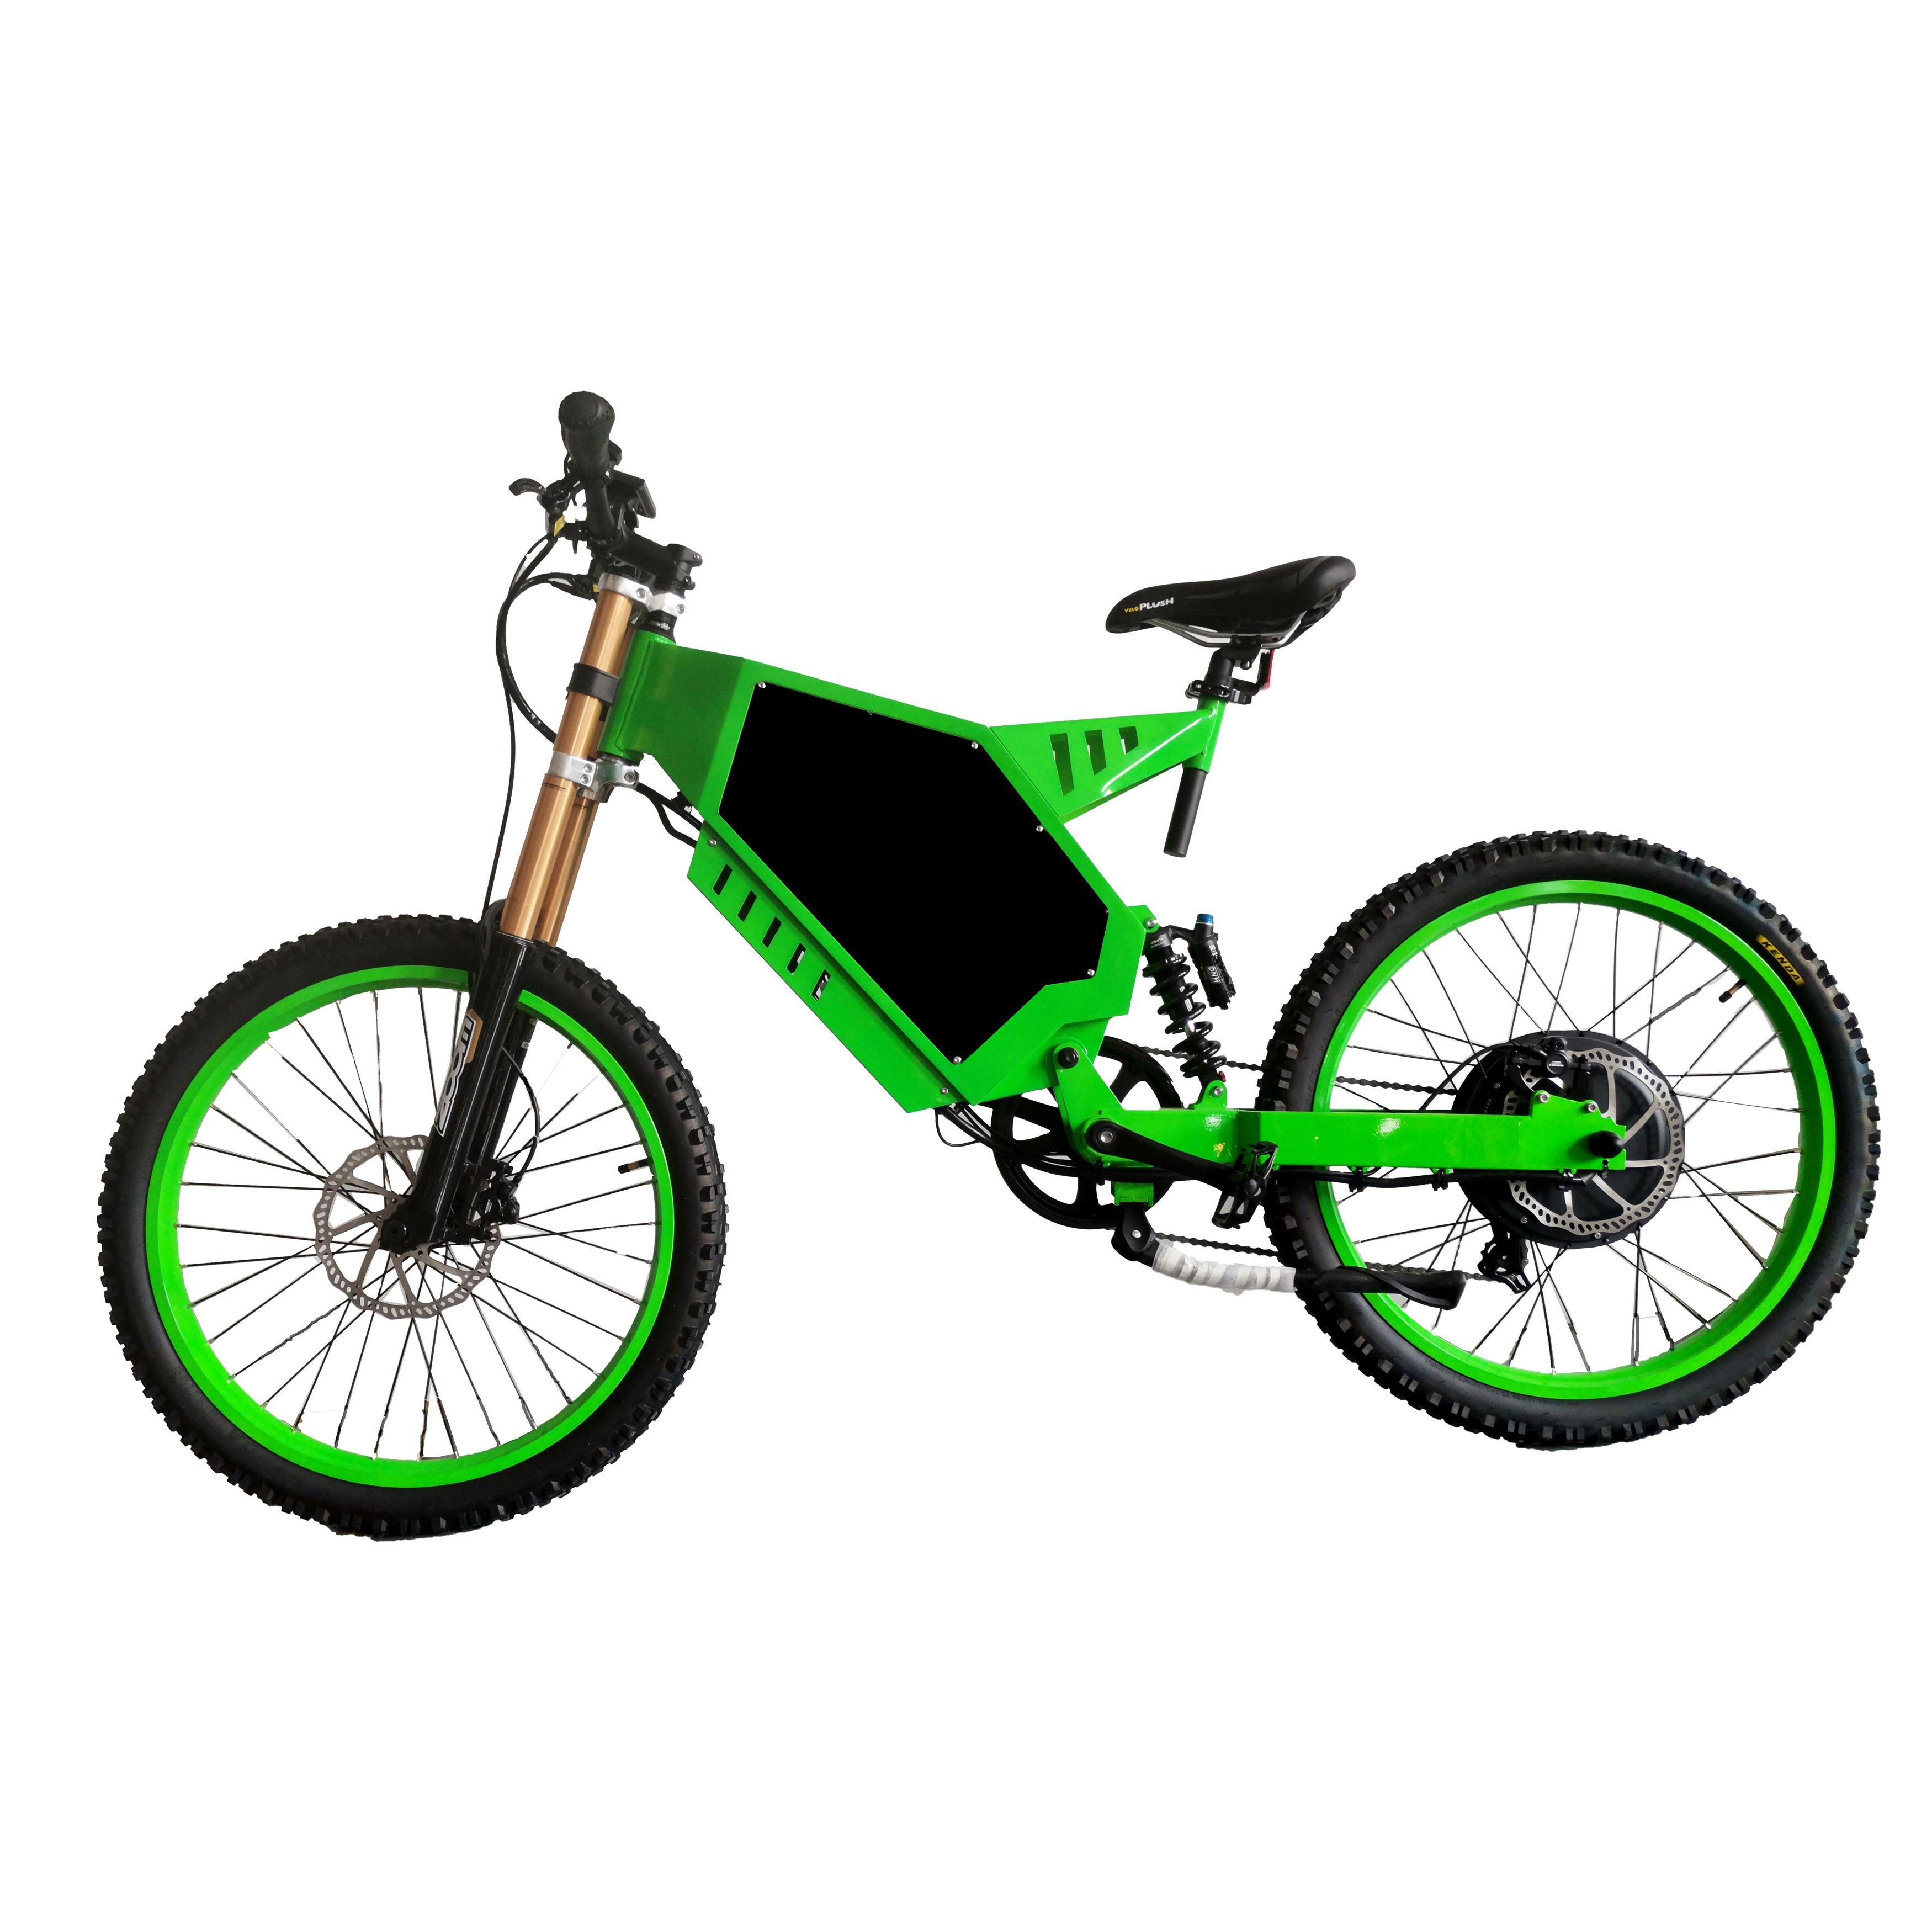 electricbicycles ebike electric bike awd electric fat bike 120km/h 12000w